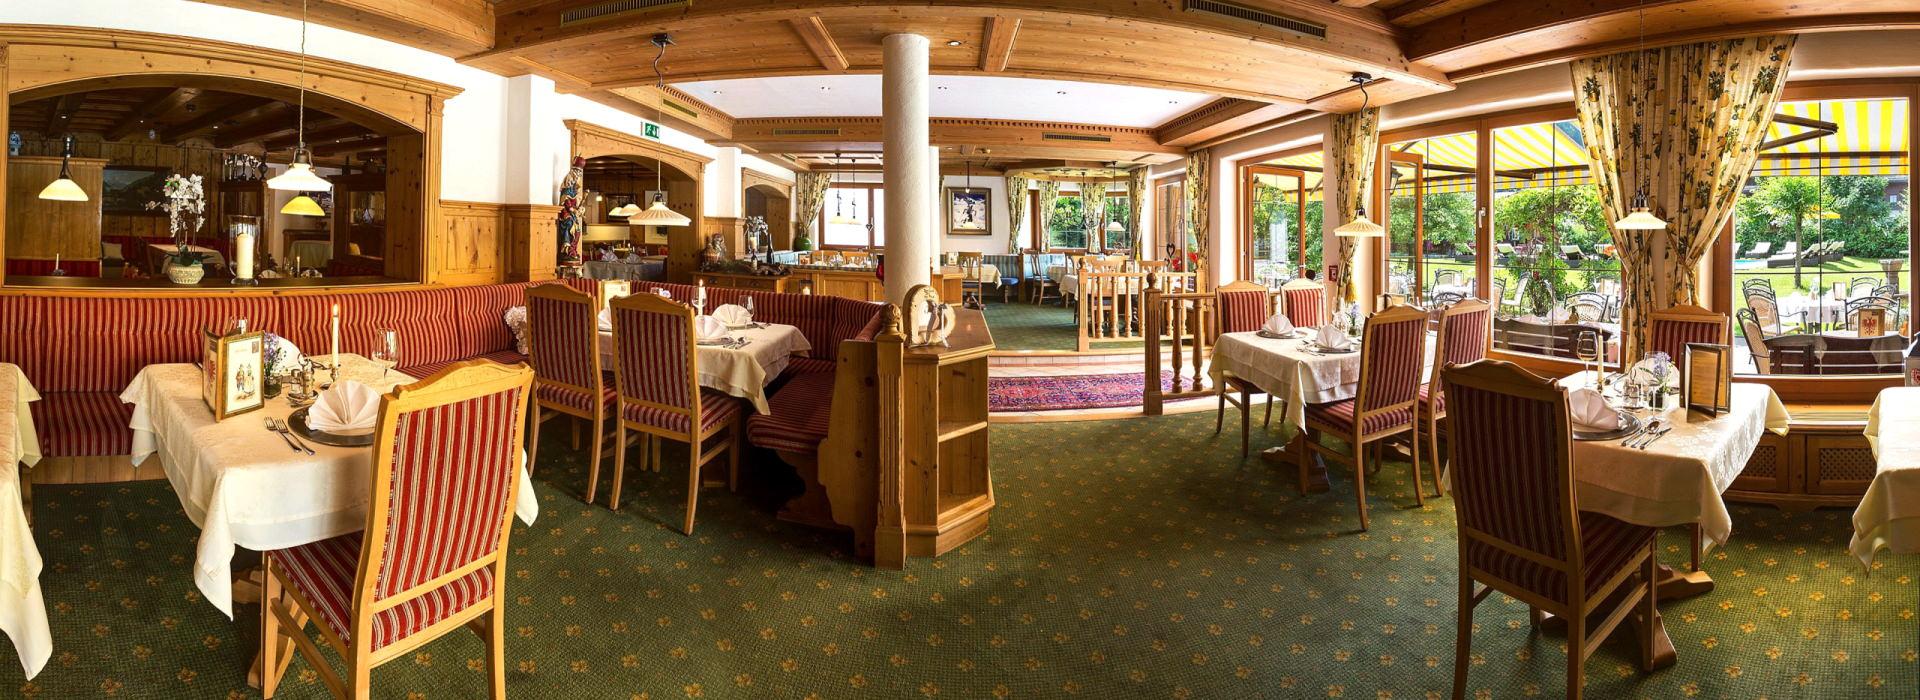 Unser Speisesaal im Alpenhotel Tirolerhof**** Neustift